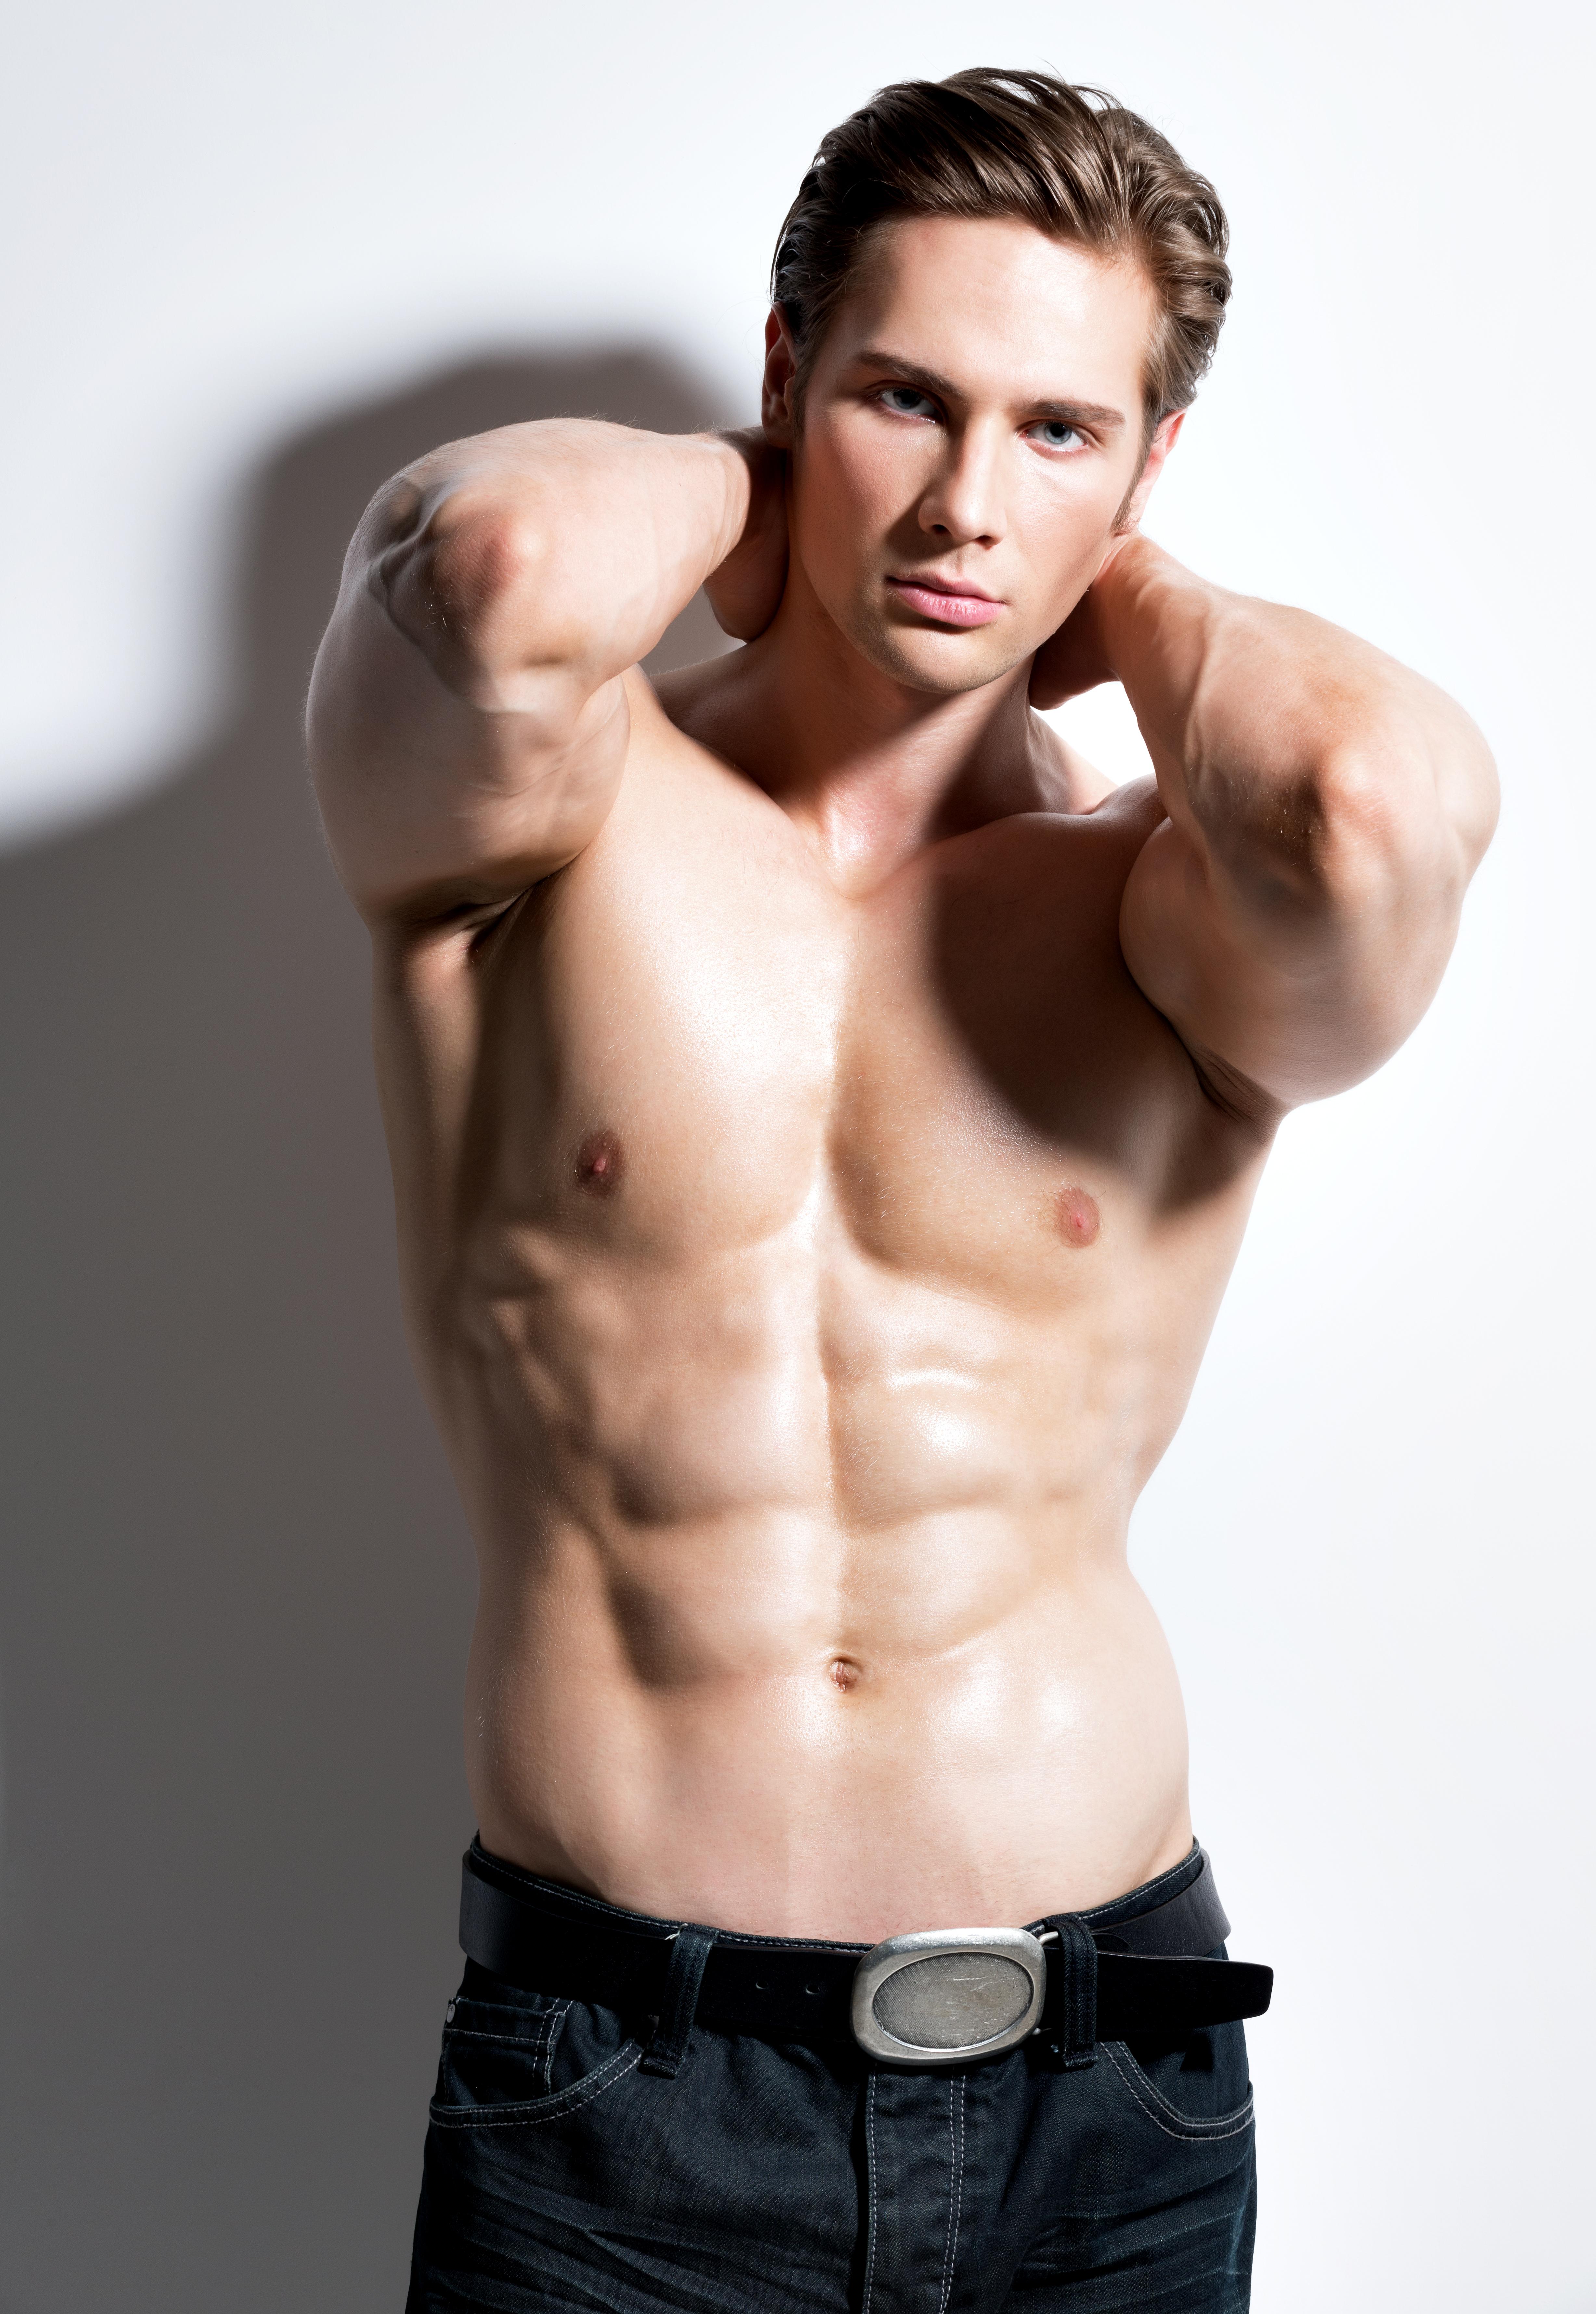 Owen Sound Male Strippers